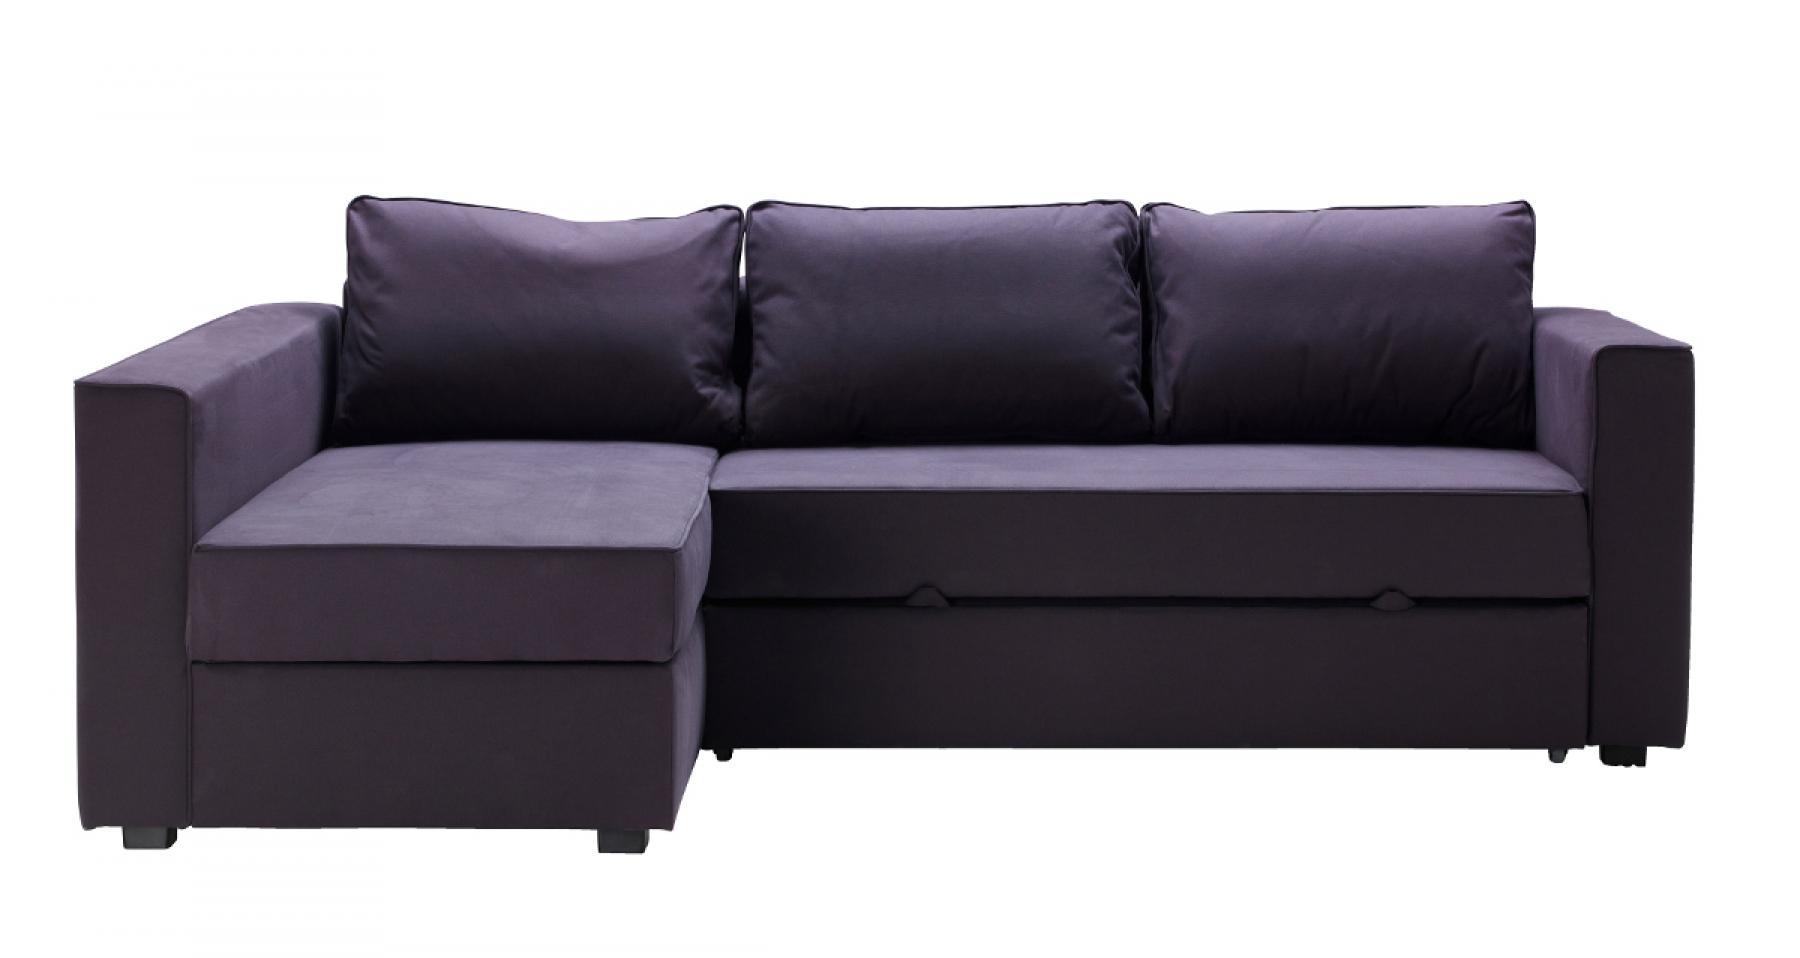 Ikea Canapé Convertible 3 Places Inspirant Photos Canapé Meri Nne Centralillaw